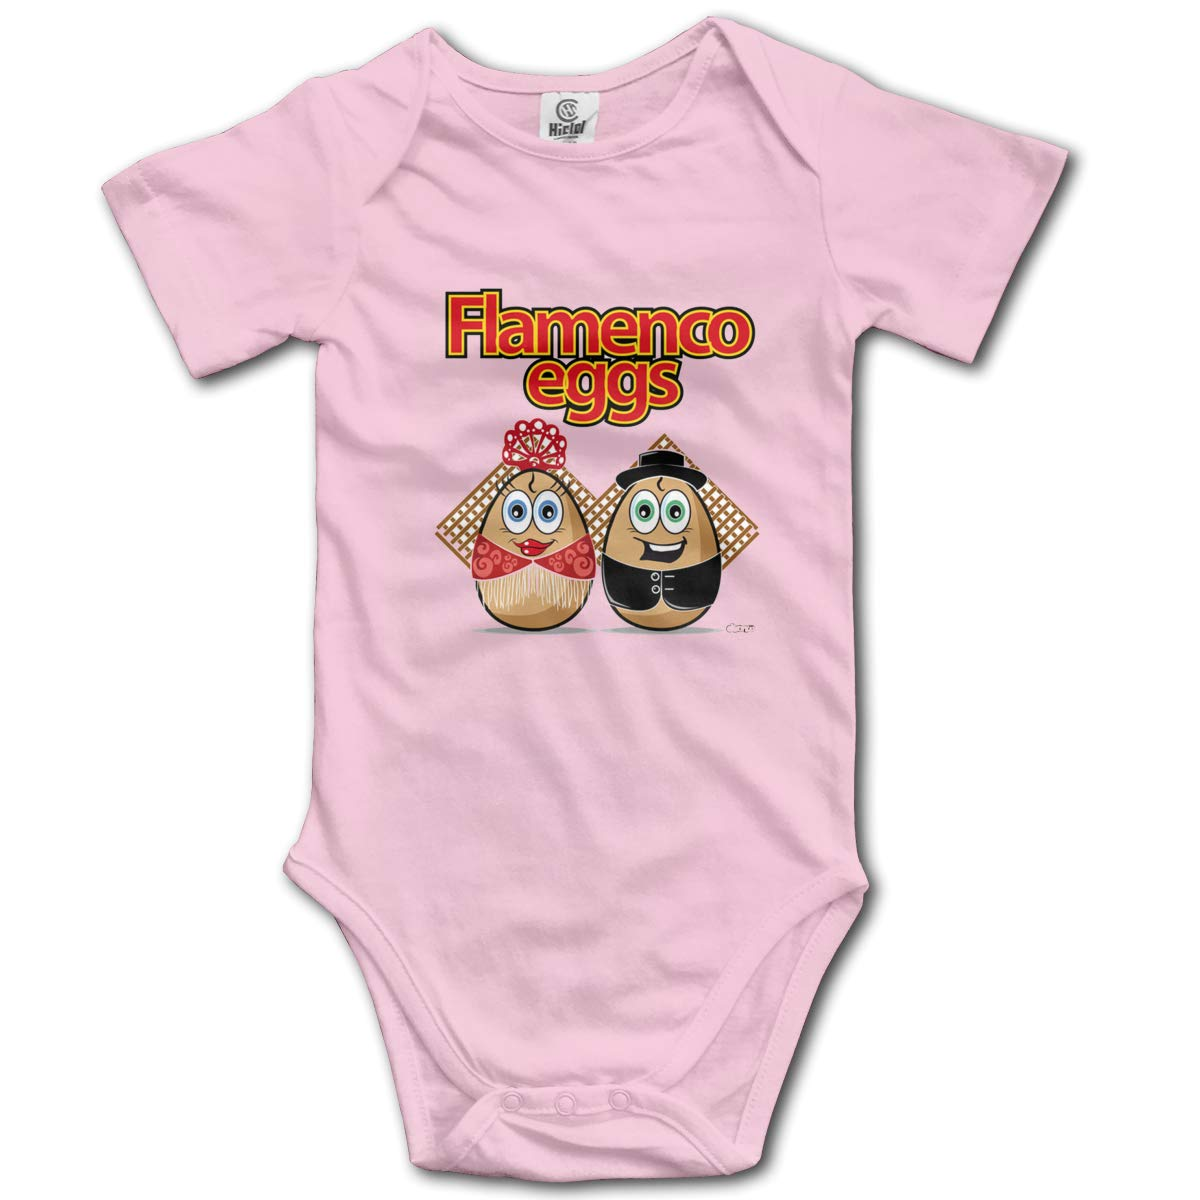 Coollifea Flamenco Eggs Baby Romper 0-18 Months Newborn Baby Girls Boys Layette Rompers Black